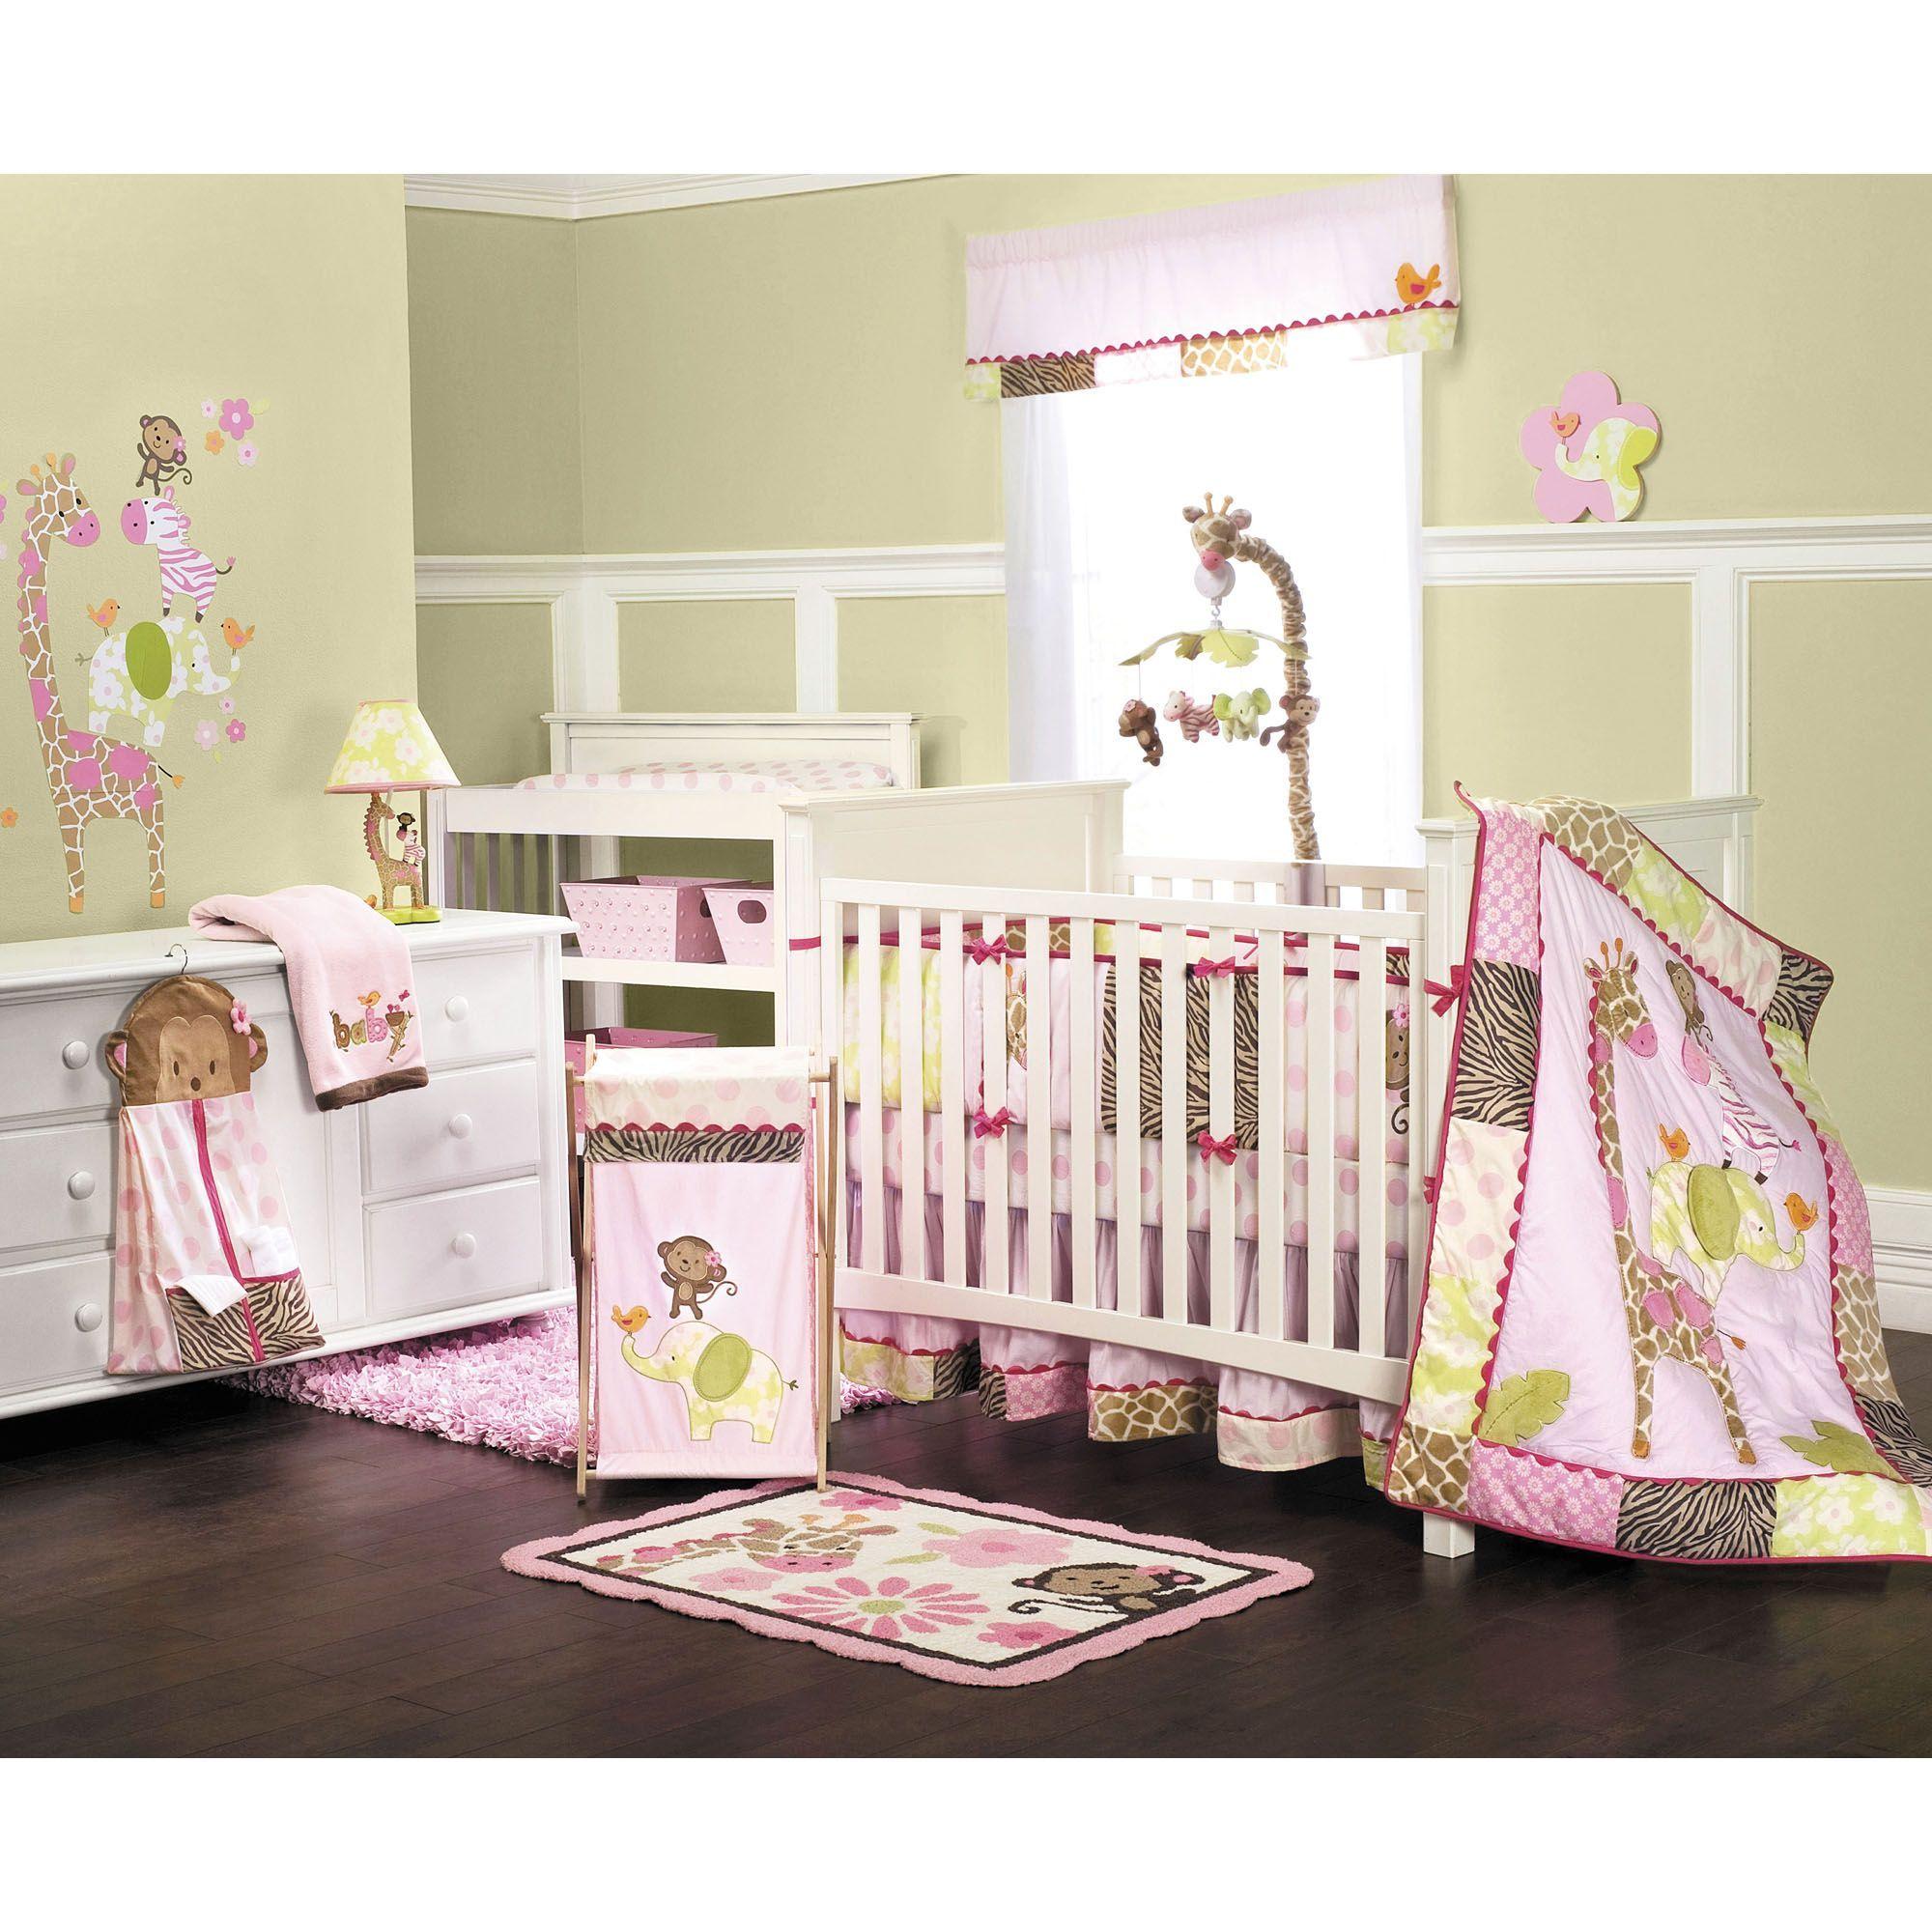 Carter S Nursery Set Jungle Jill Baby Crib Bedding